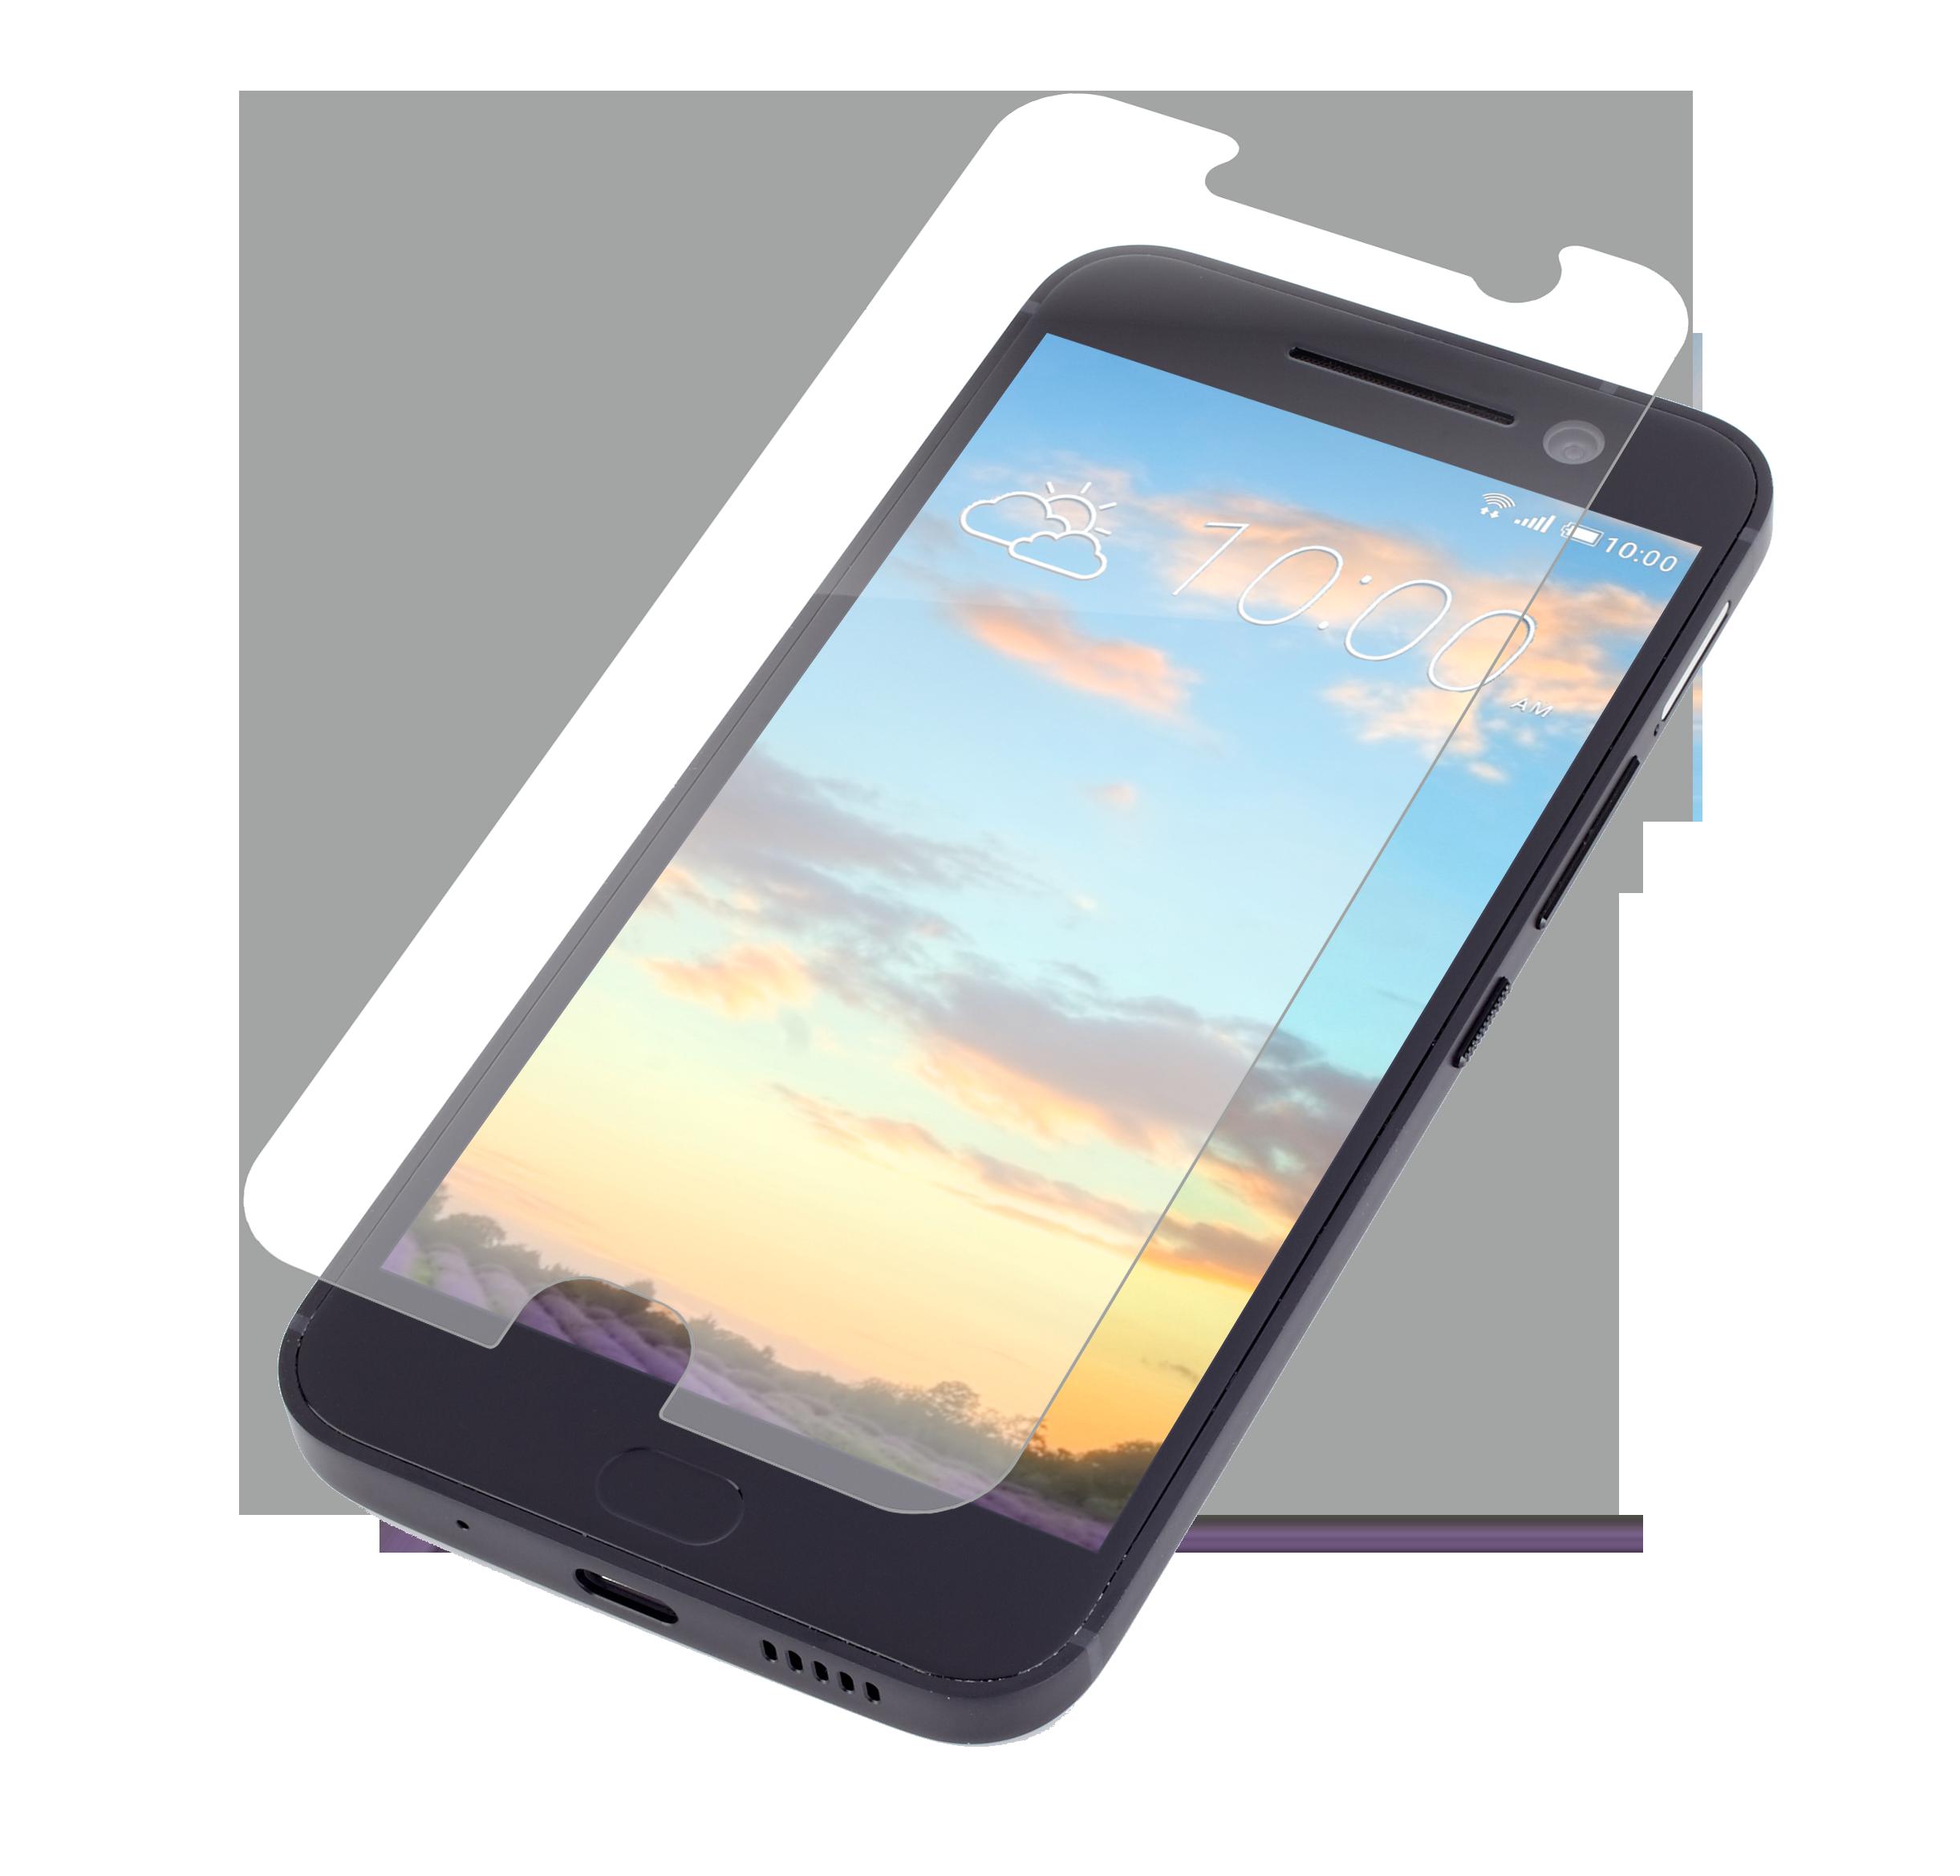 InvisibleShield Original for the HTC 10